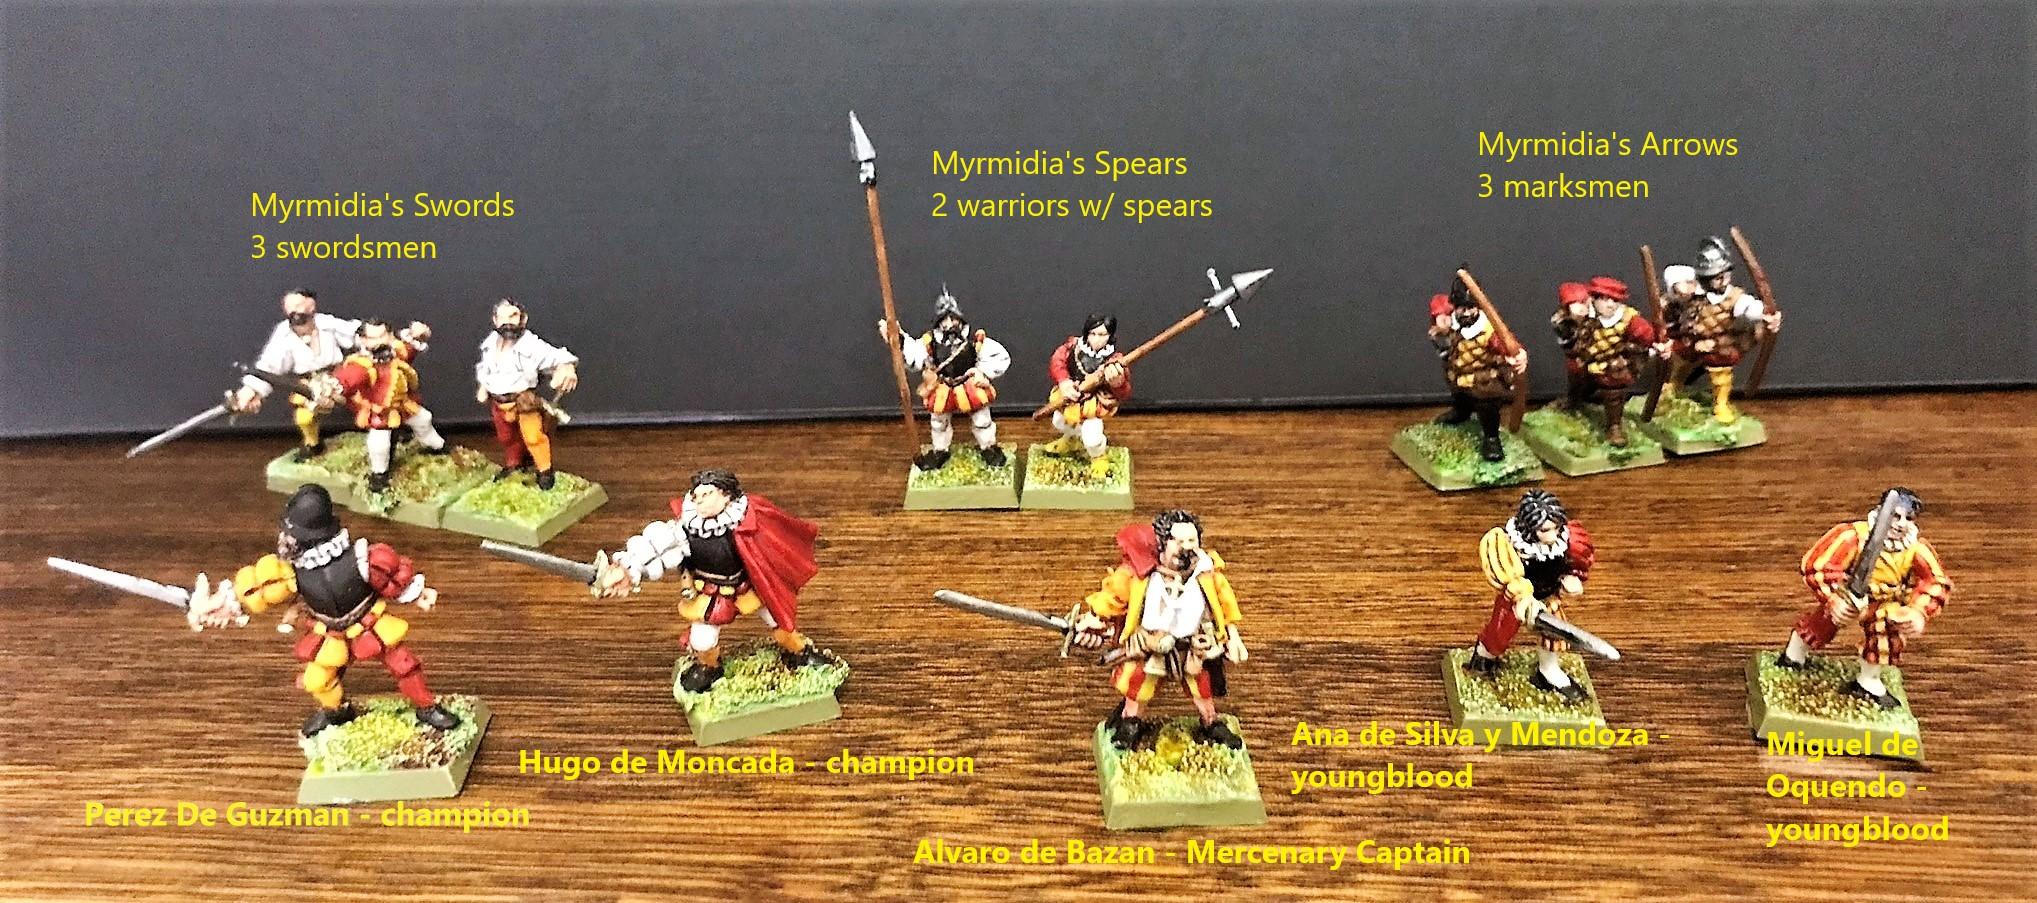 Estalian Armada starting warband